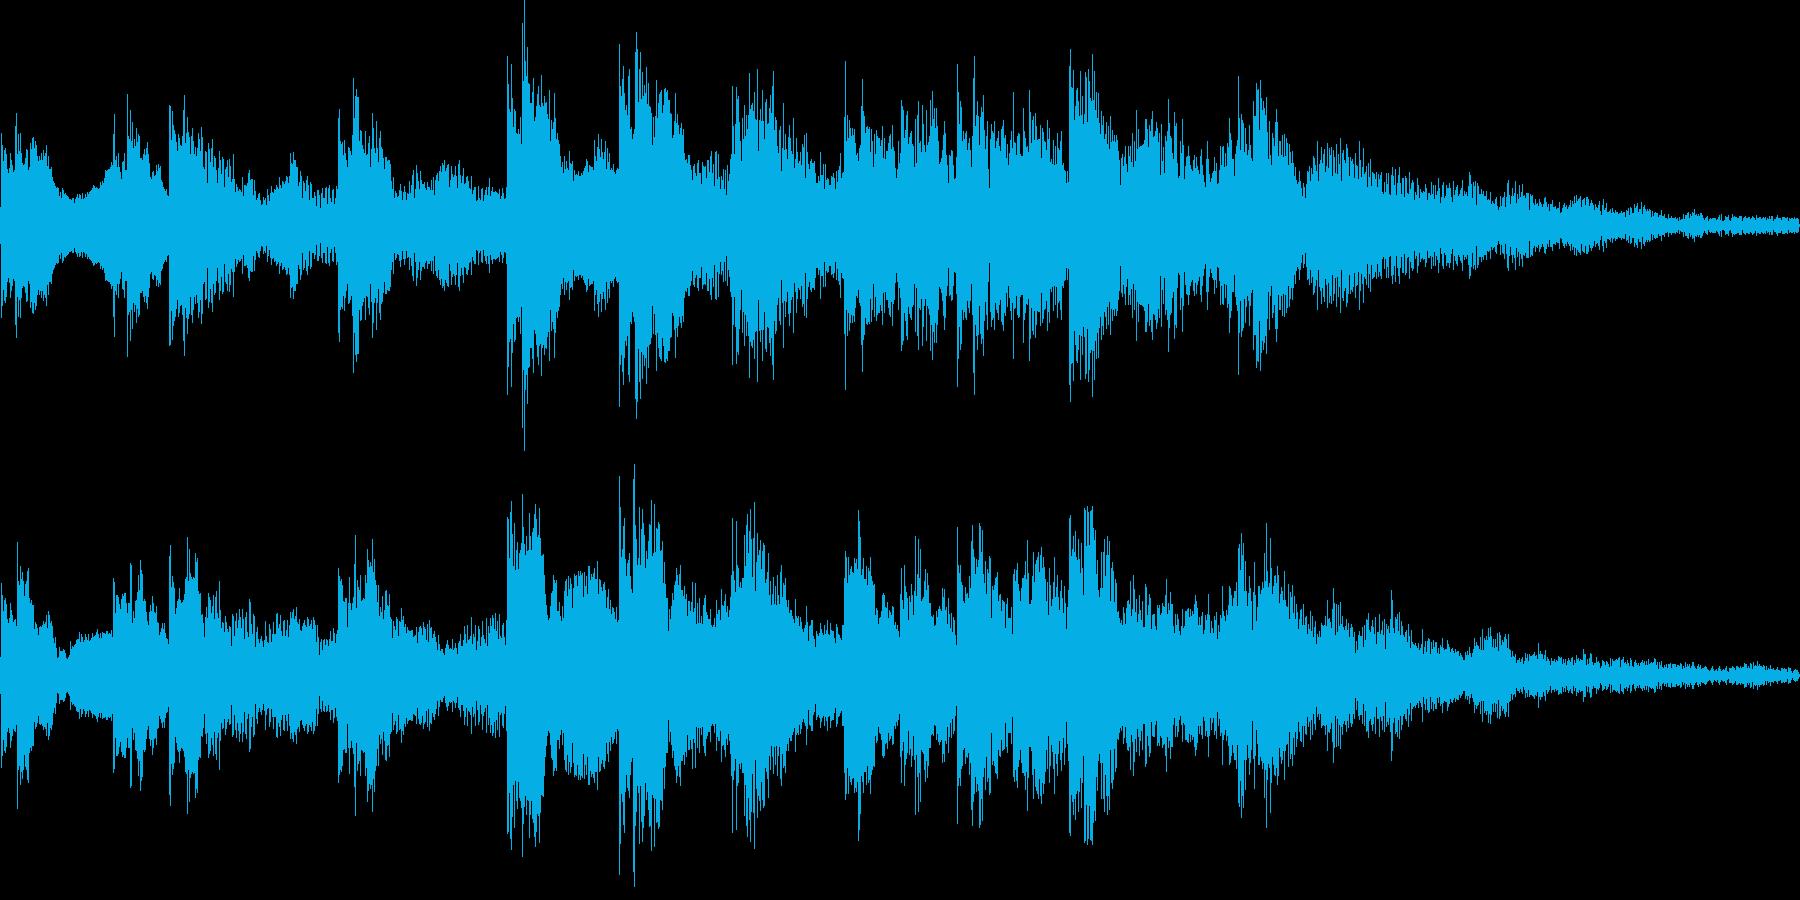 k012 アラーム音(ループ仕様)の再生済みの波形